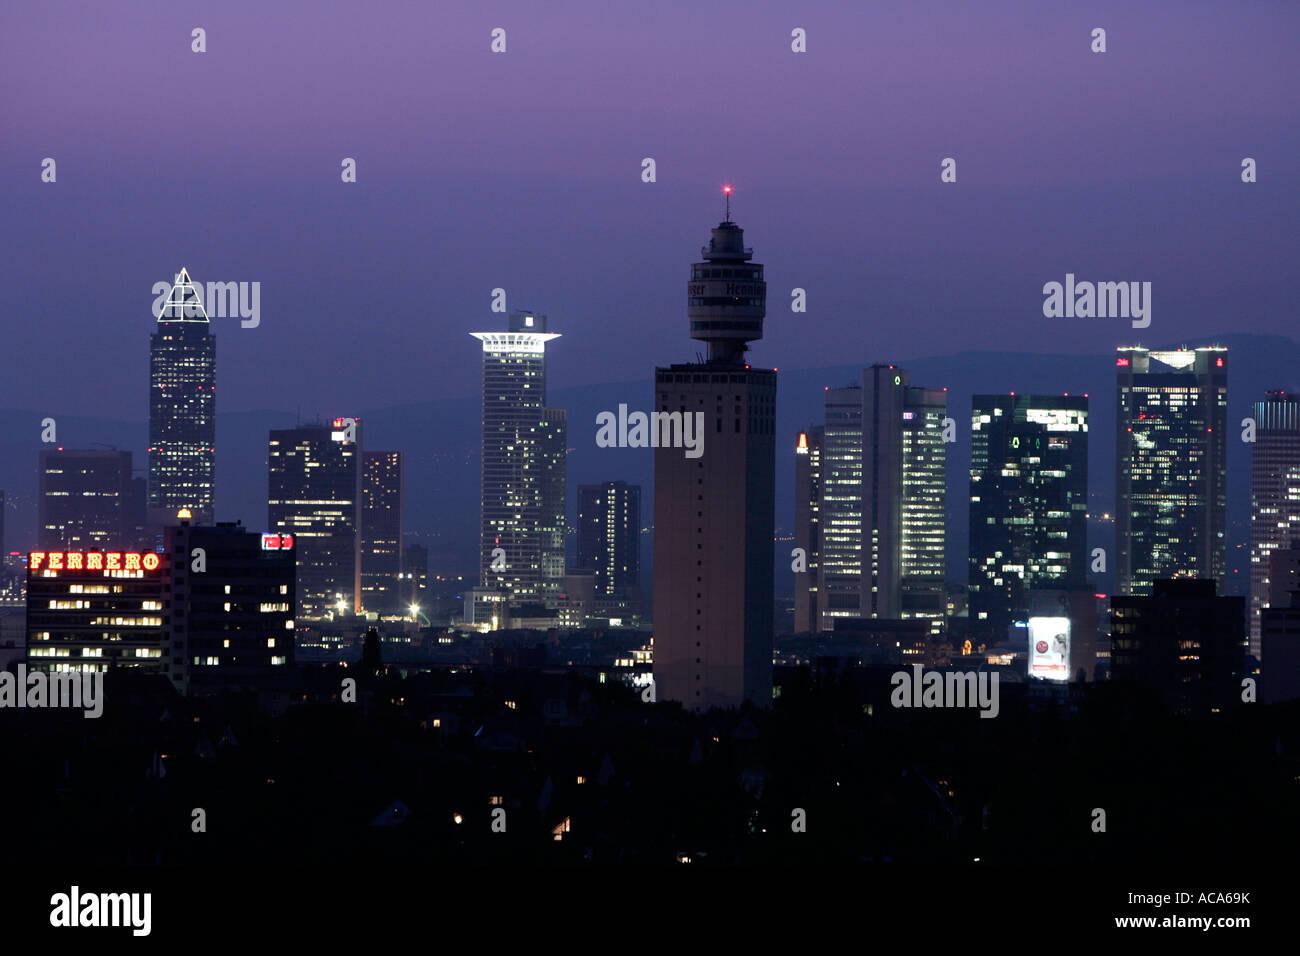 Skyline of Frankfurt am Main with the Henninger tower at night, Frankfurt, Hesse, Germany - Stock Image